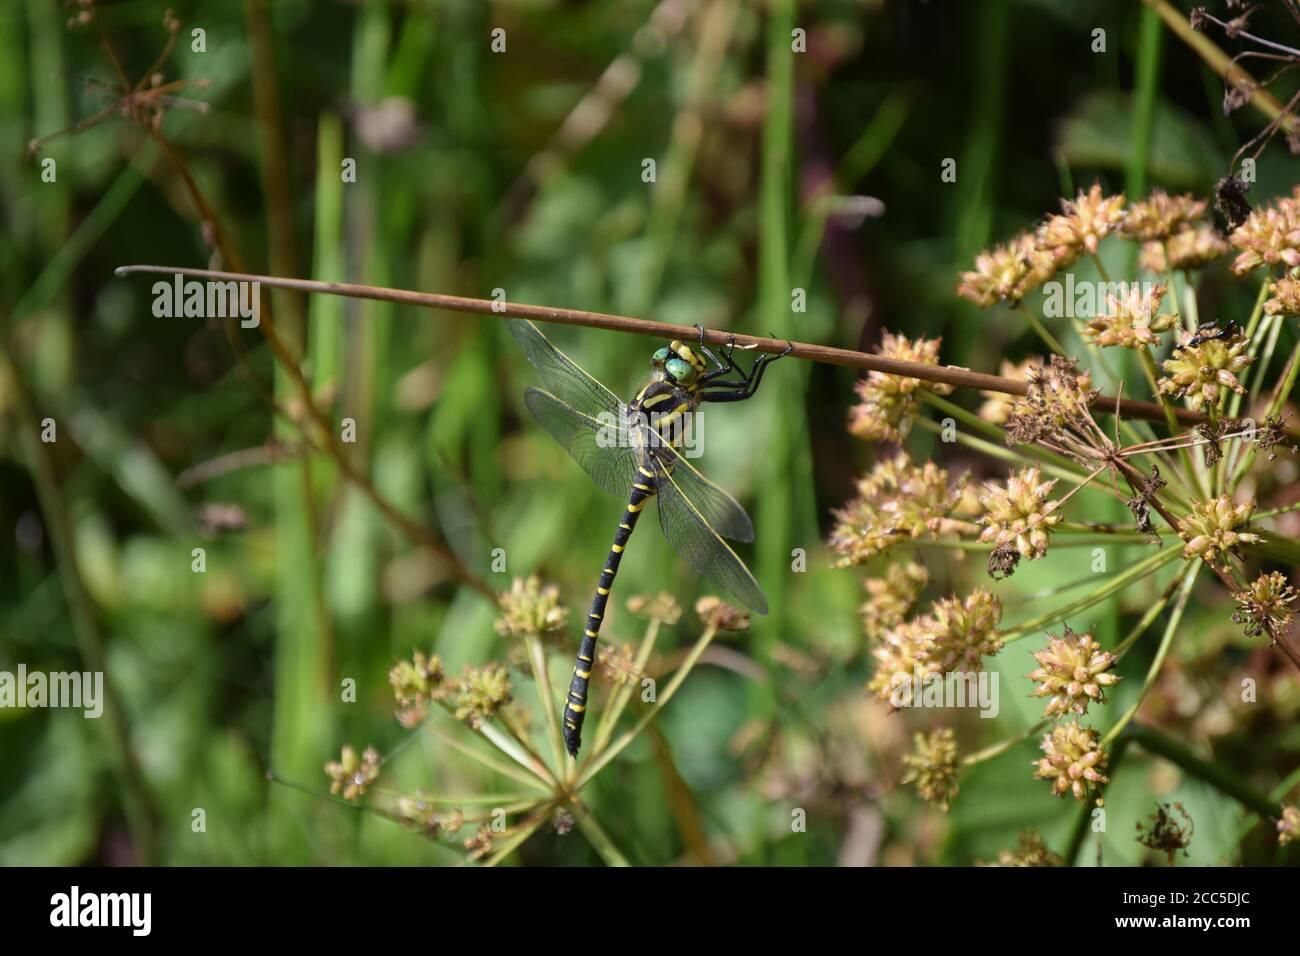 Dragonfly de anillo dorado colgando del tallo Foto de stock